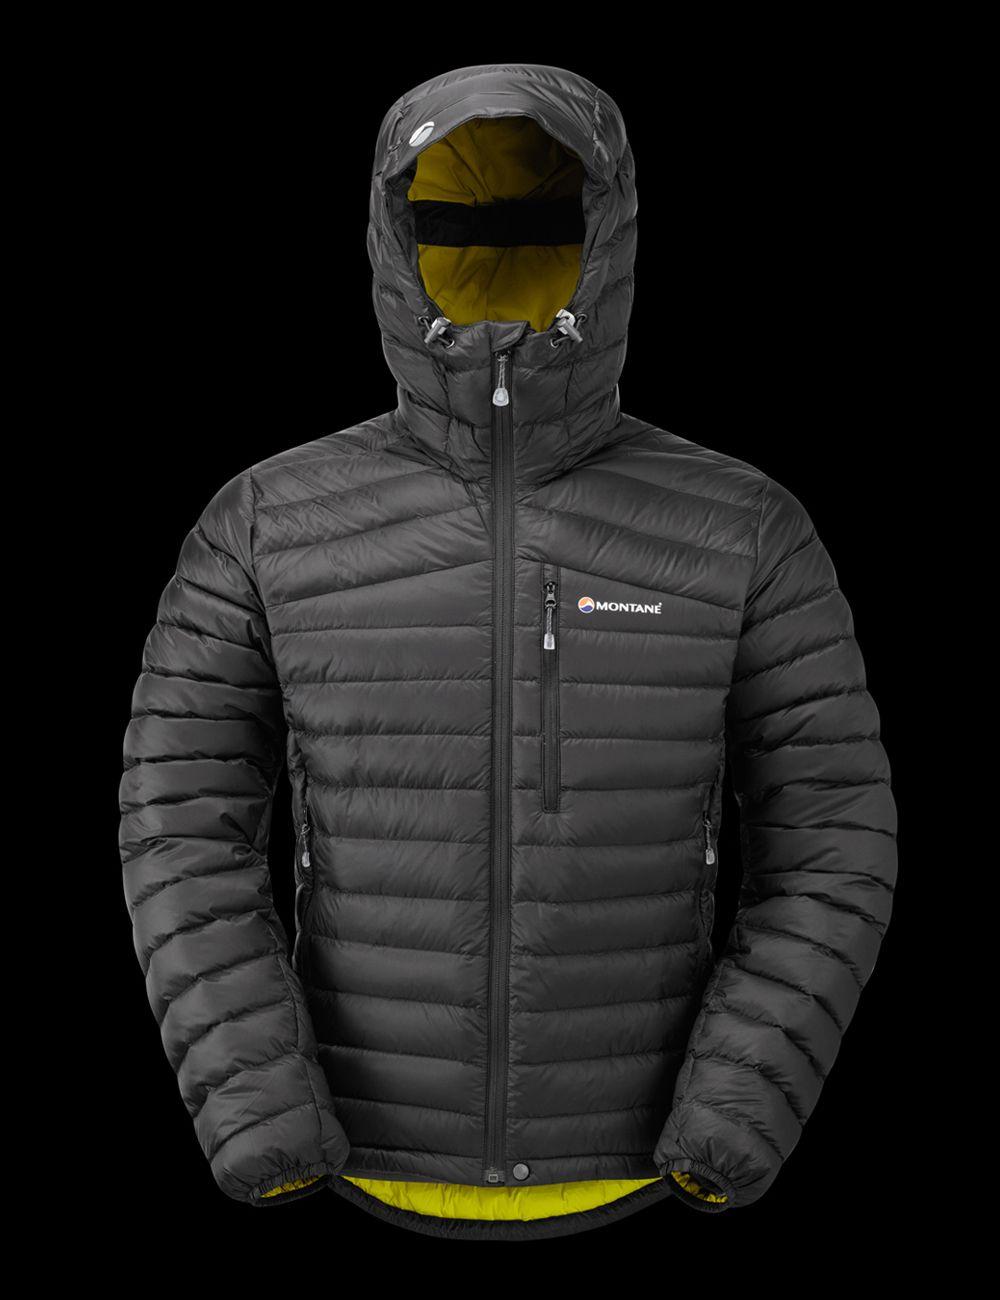 Montane Mens Featherlite Down Jacket-Black Small